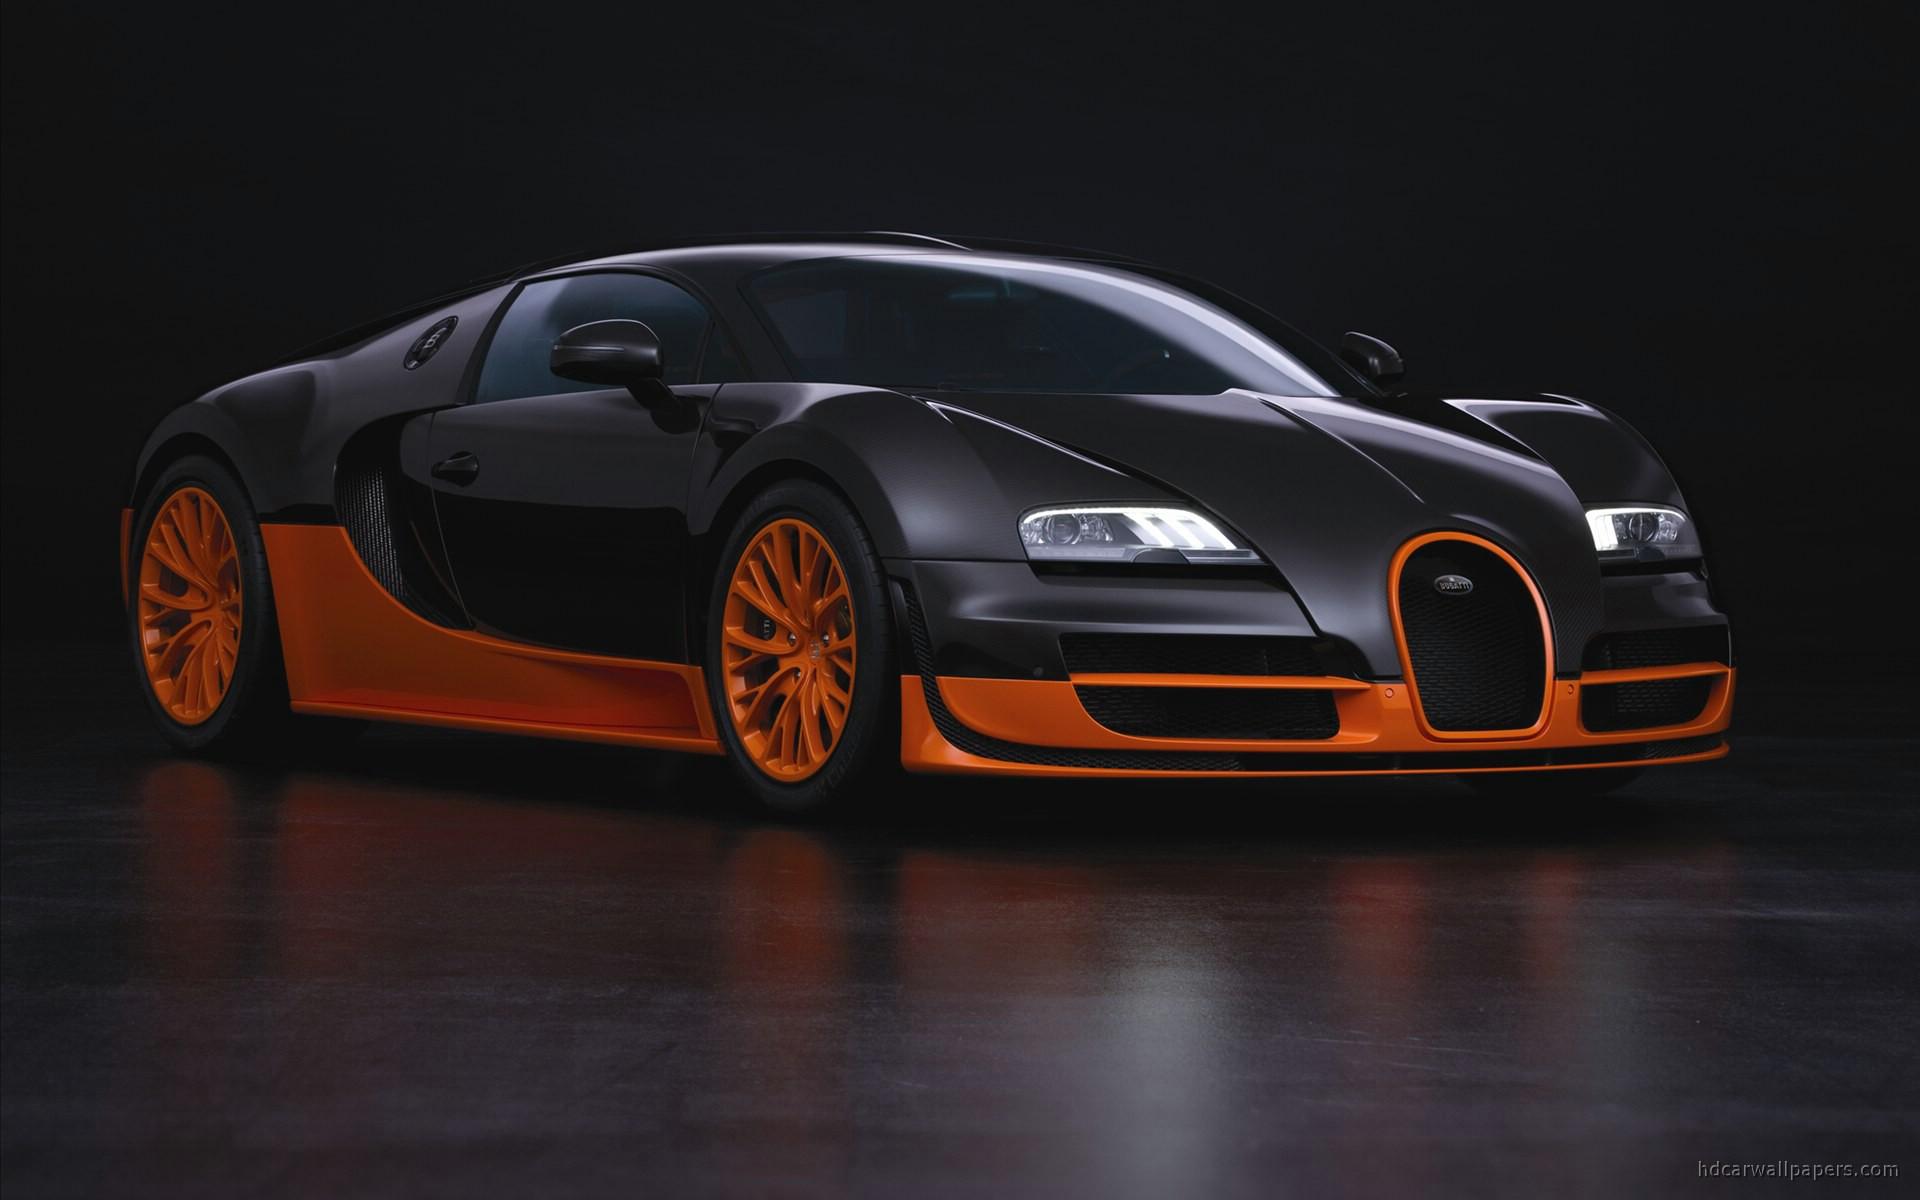 1920x1200 Bugatti Veyron Super Sports Car Wallpaper | HD Car Wallpapers